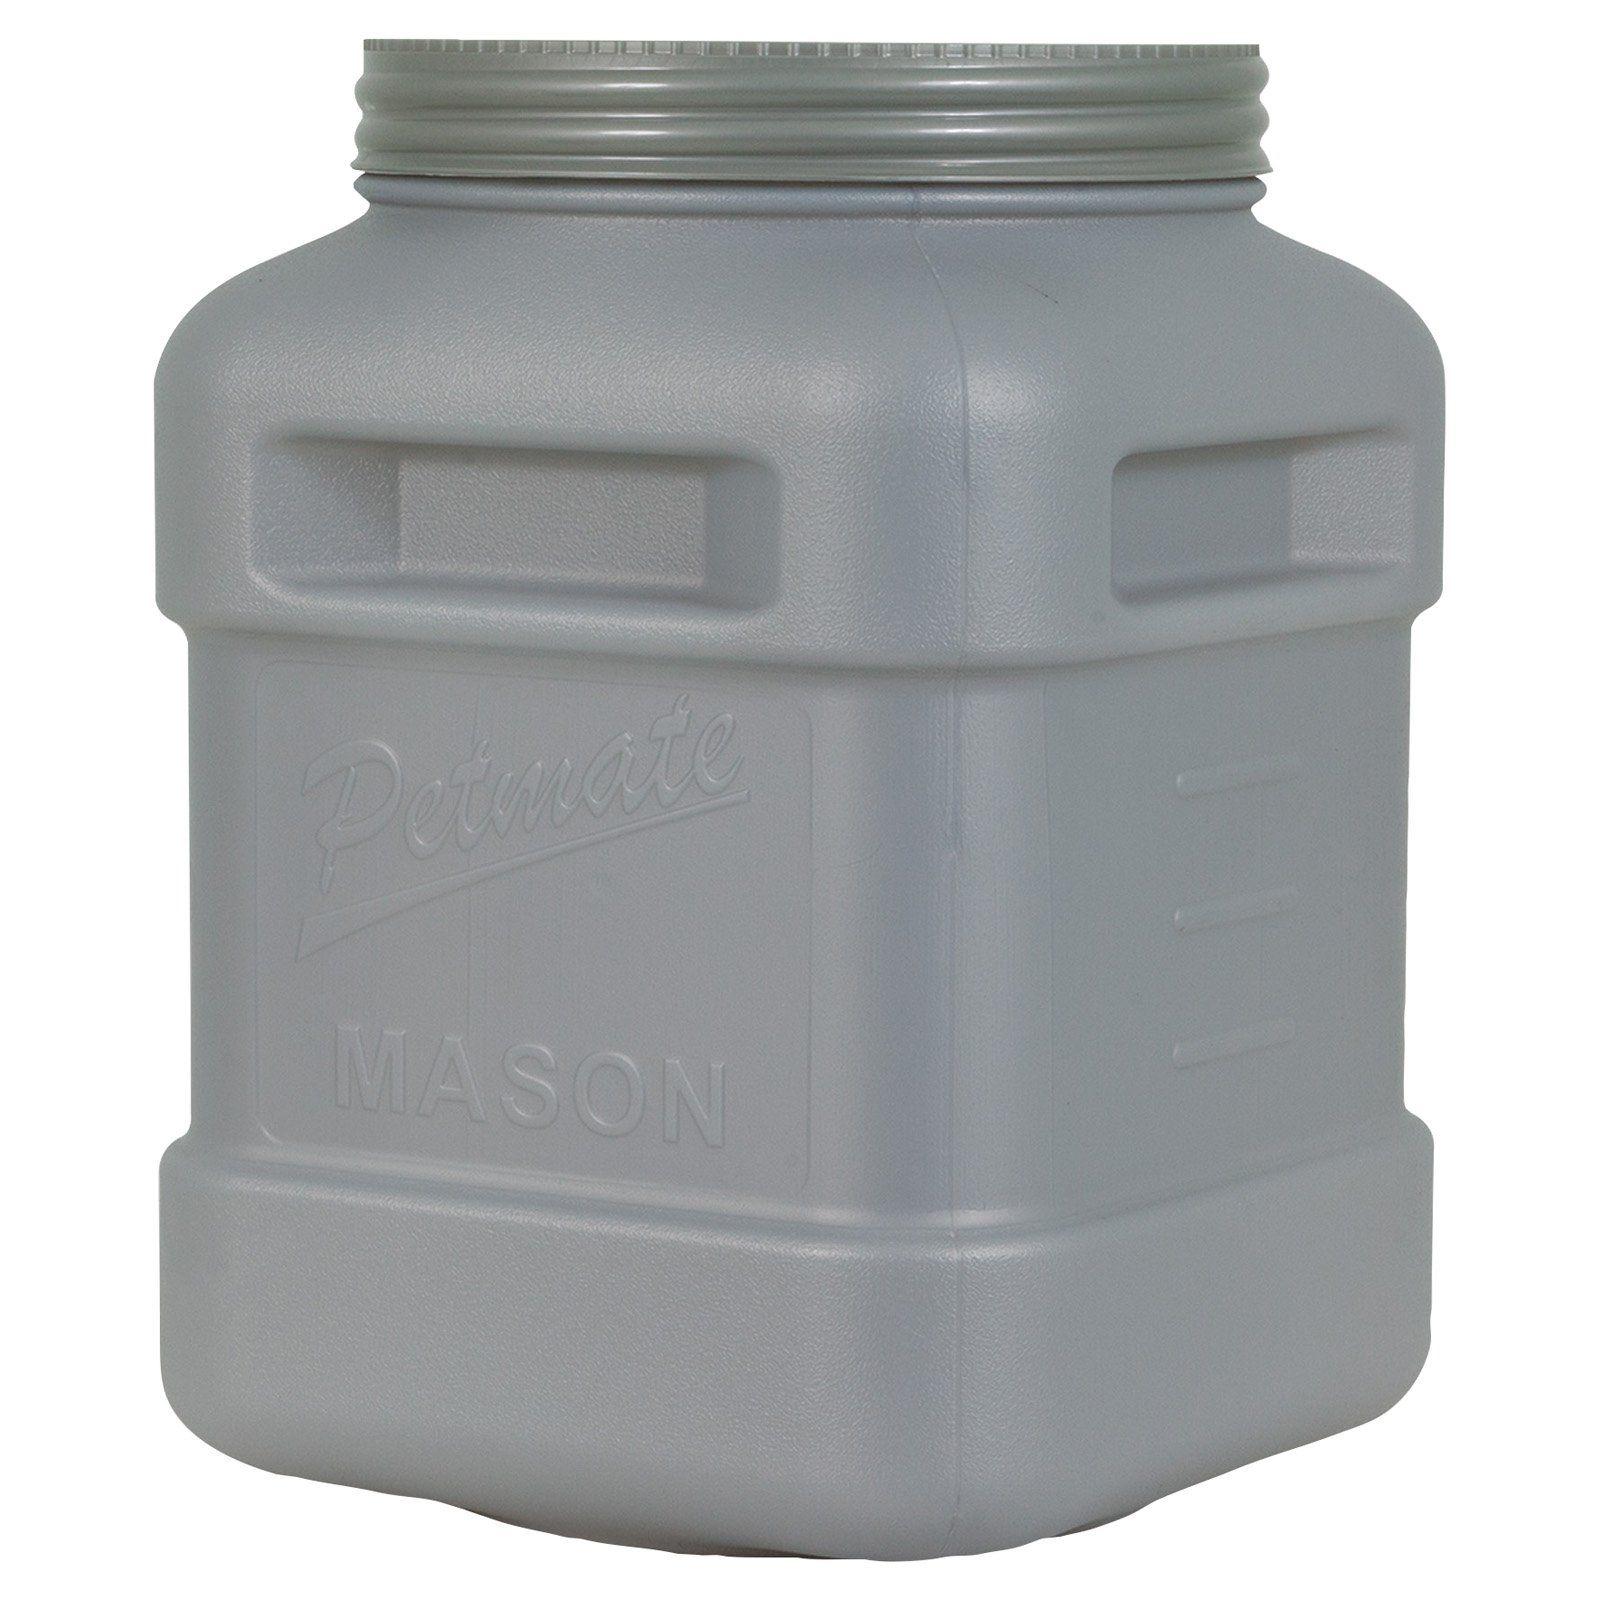 Petmate Mason Jar Food Storage Dog Food Container Pet Food